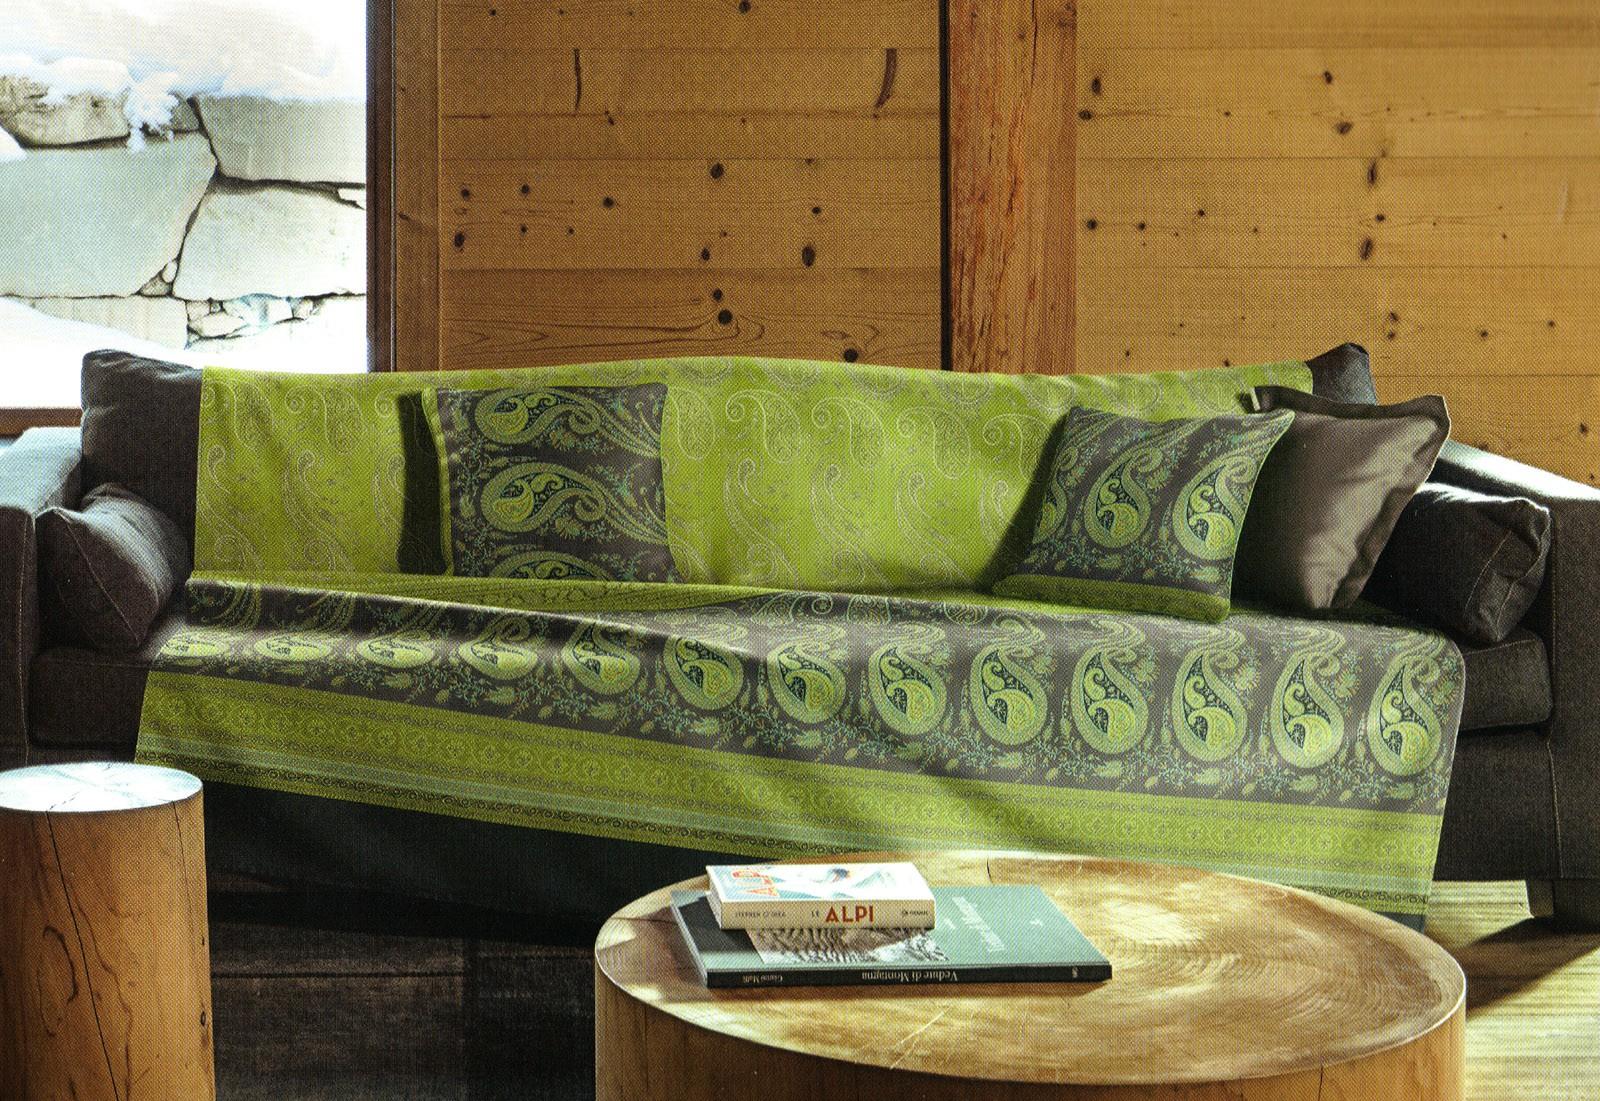 Plaid imbottito scauri verde grigio calda coperta divano for Granfoulard per divano